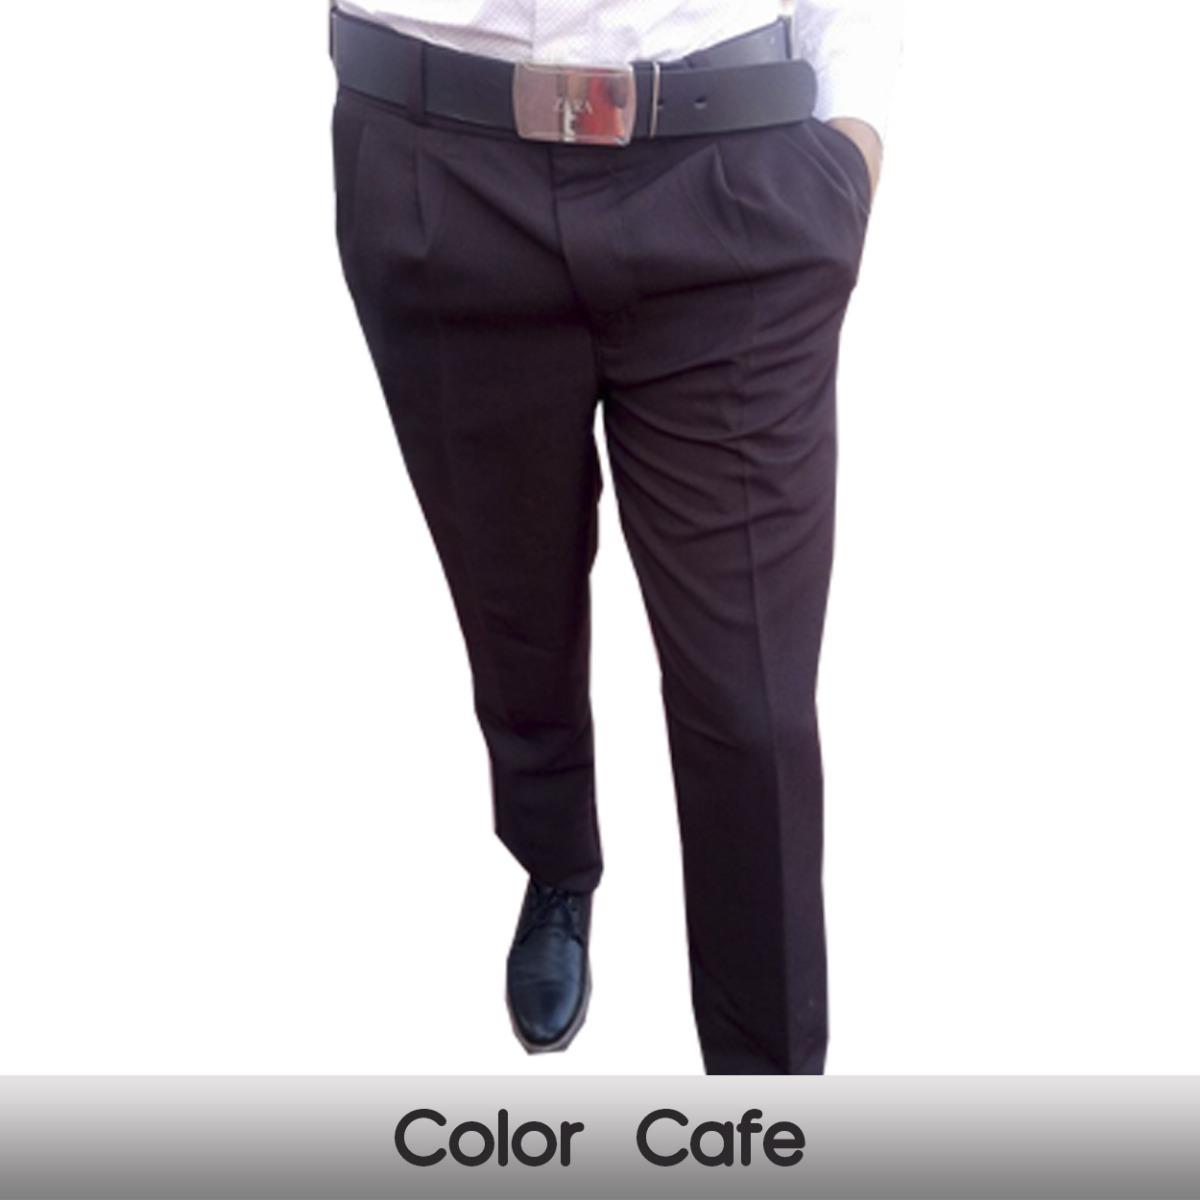 Lote De 4 Pantalones De Vestir Caballero Envio Gratis